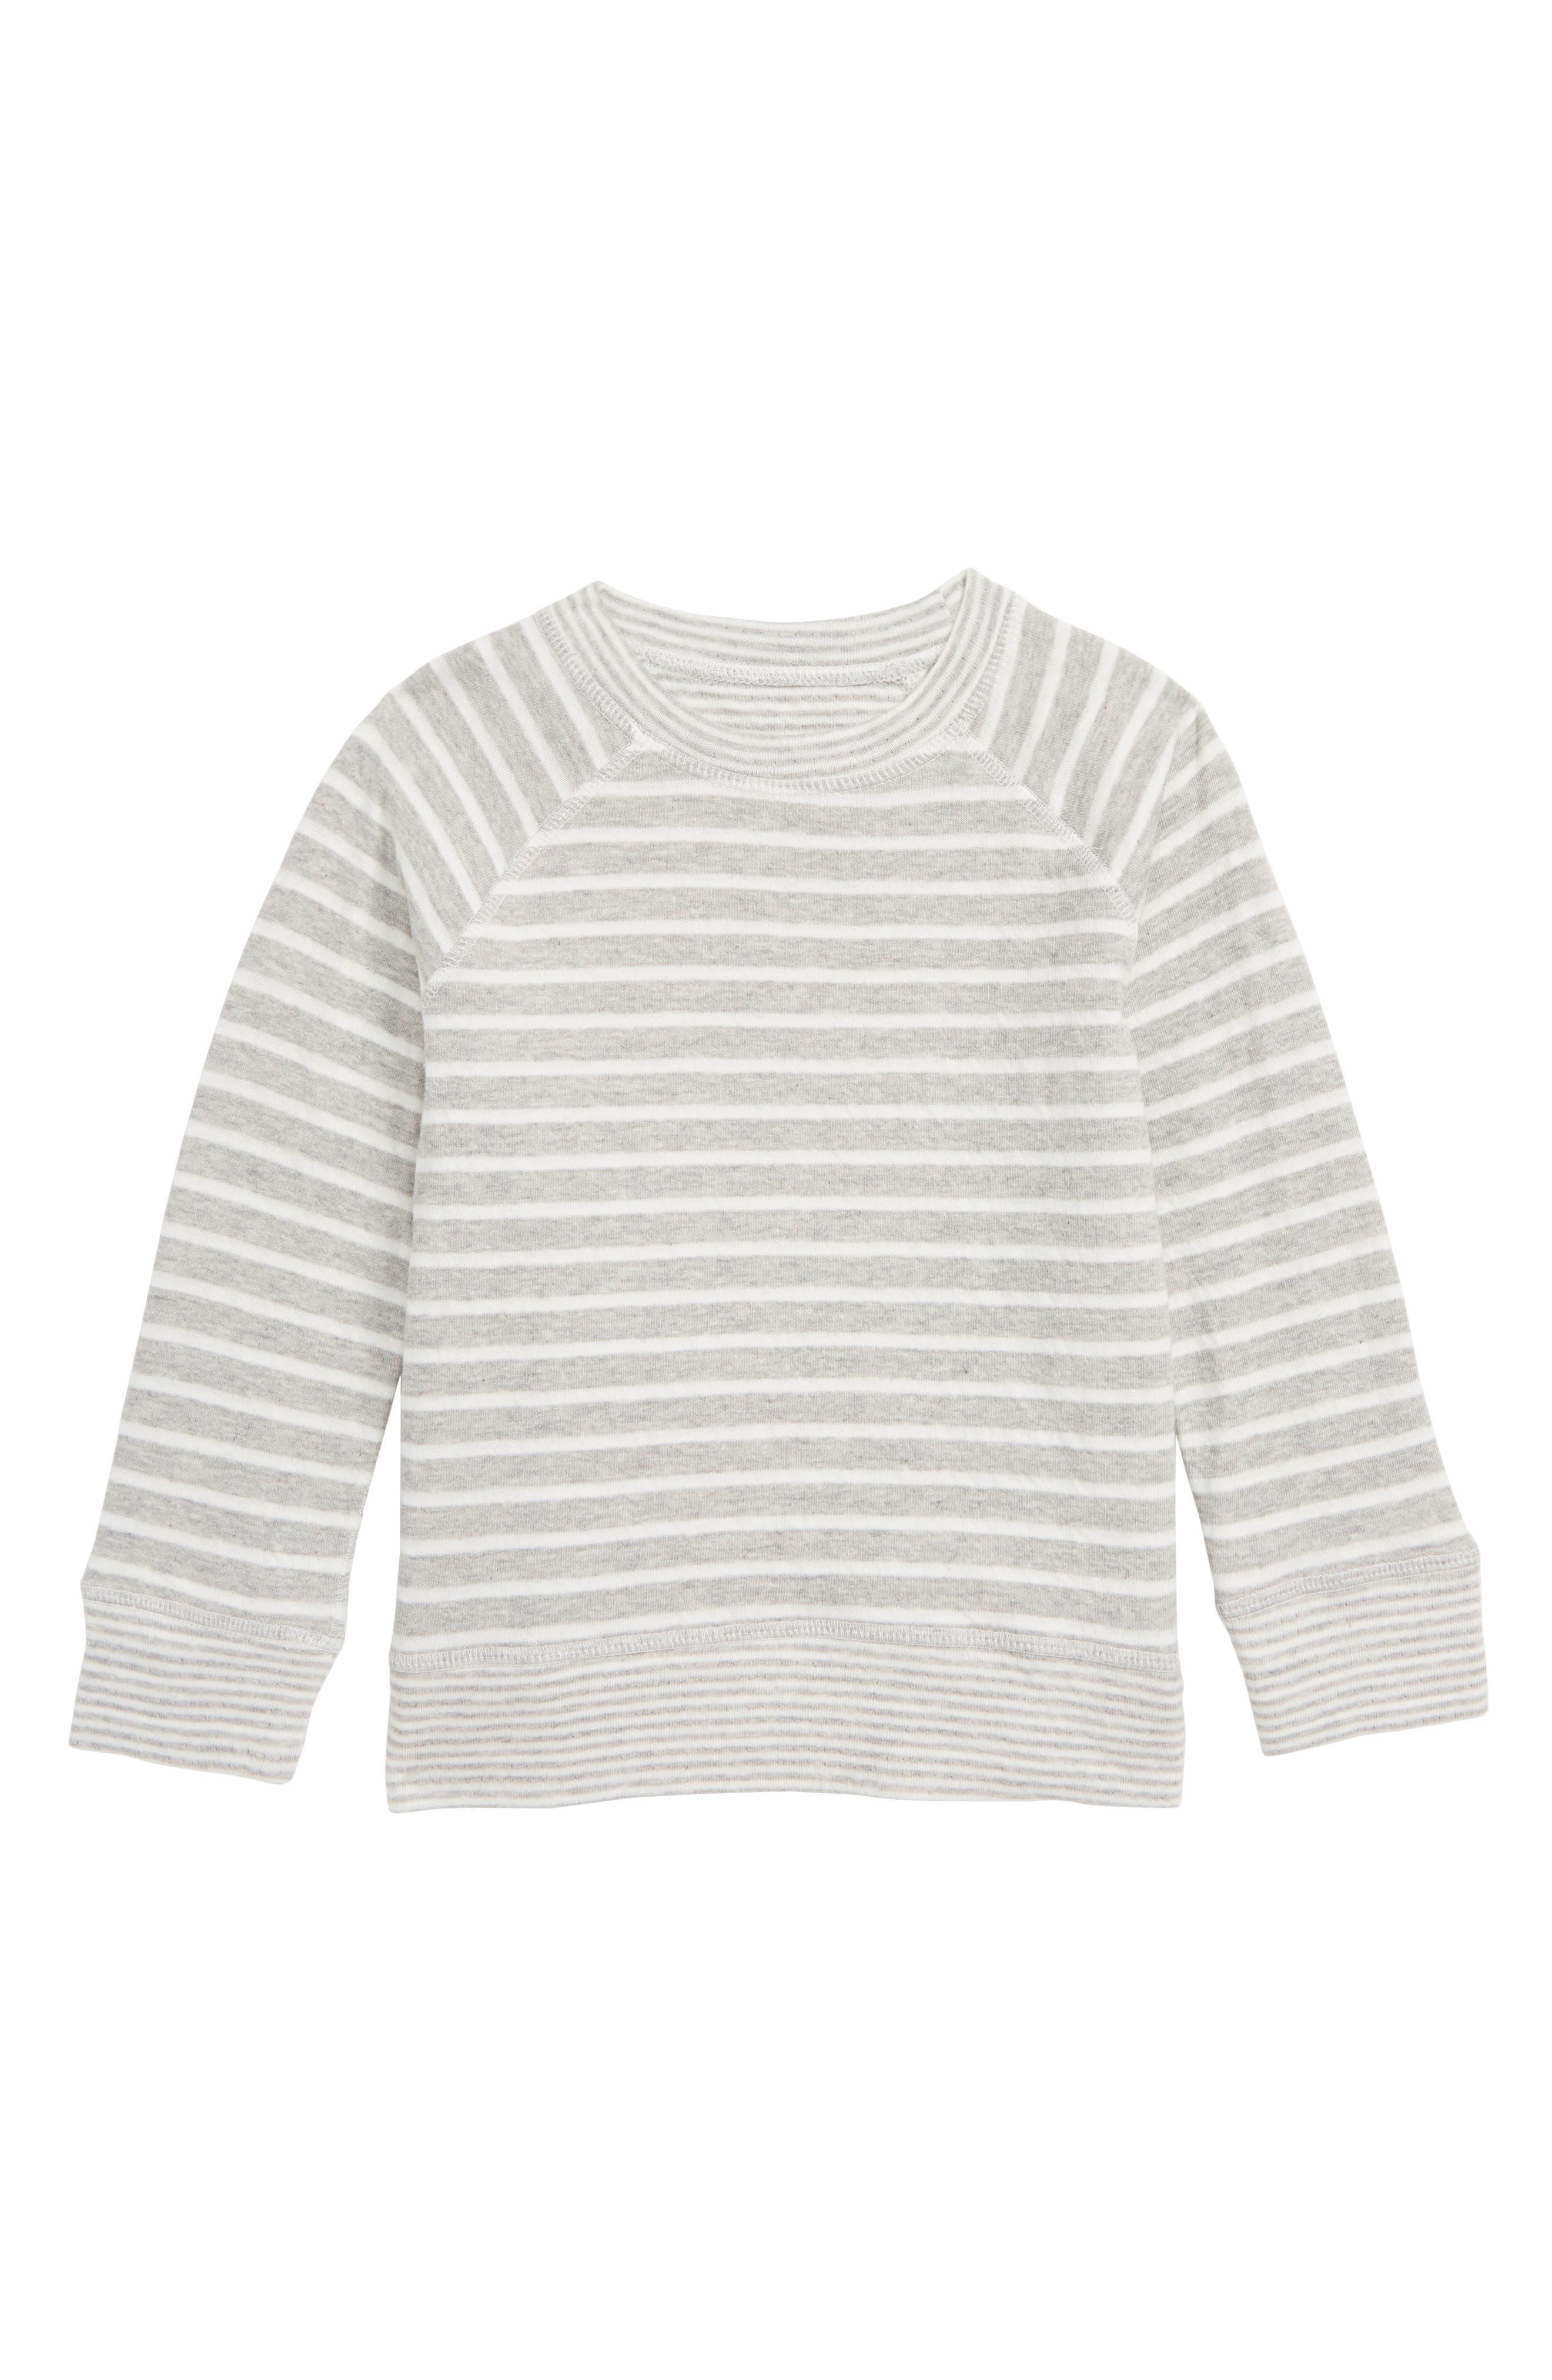 Double Layer Reversible T-Shirt,                             Main thumbnail 1, color,                             GREY MARL/ ECRU